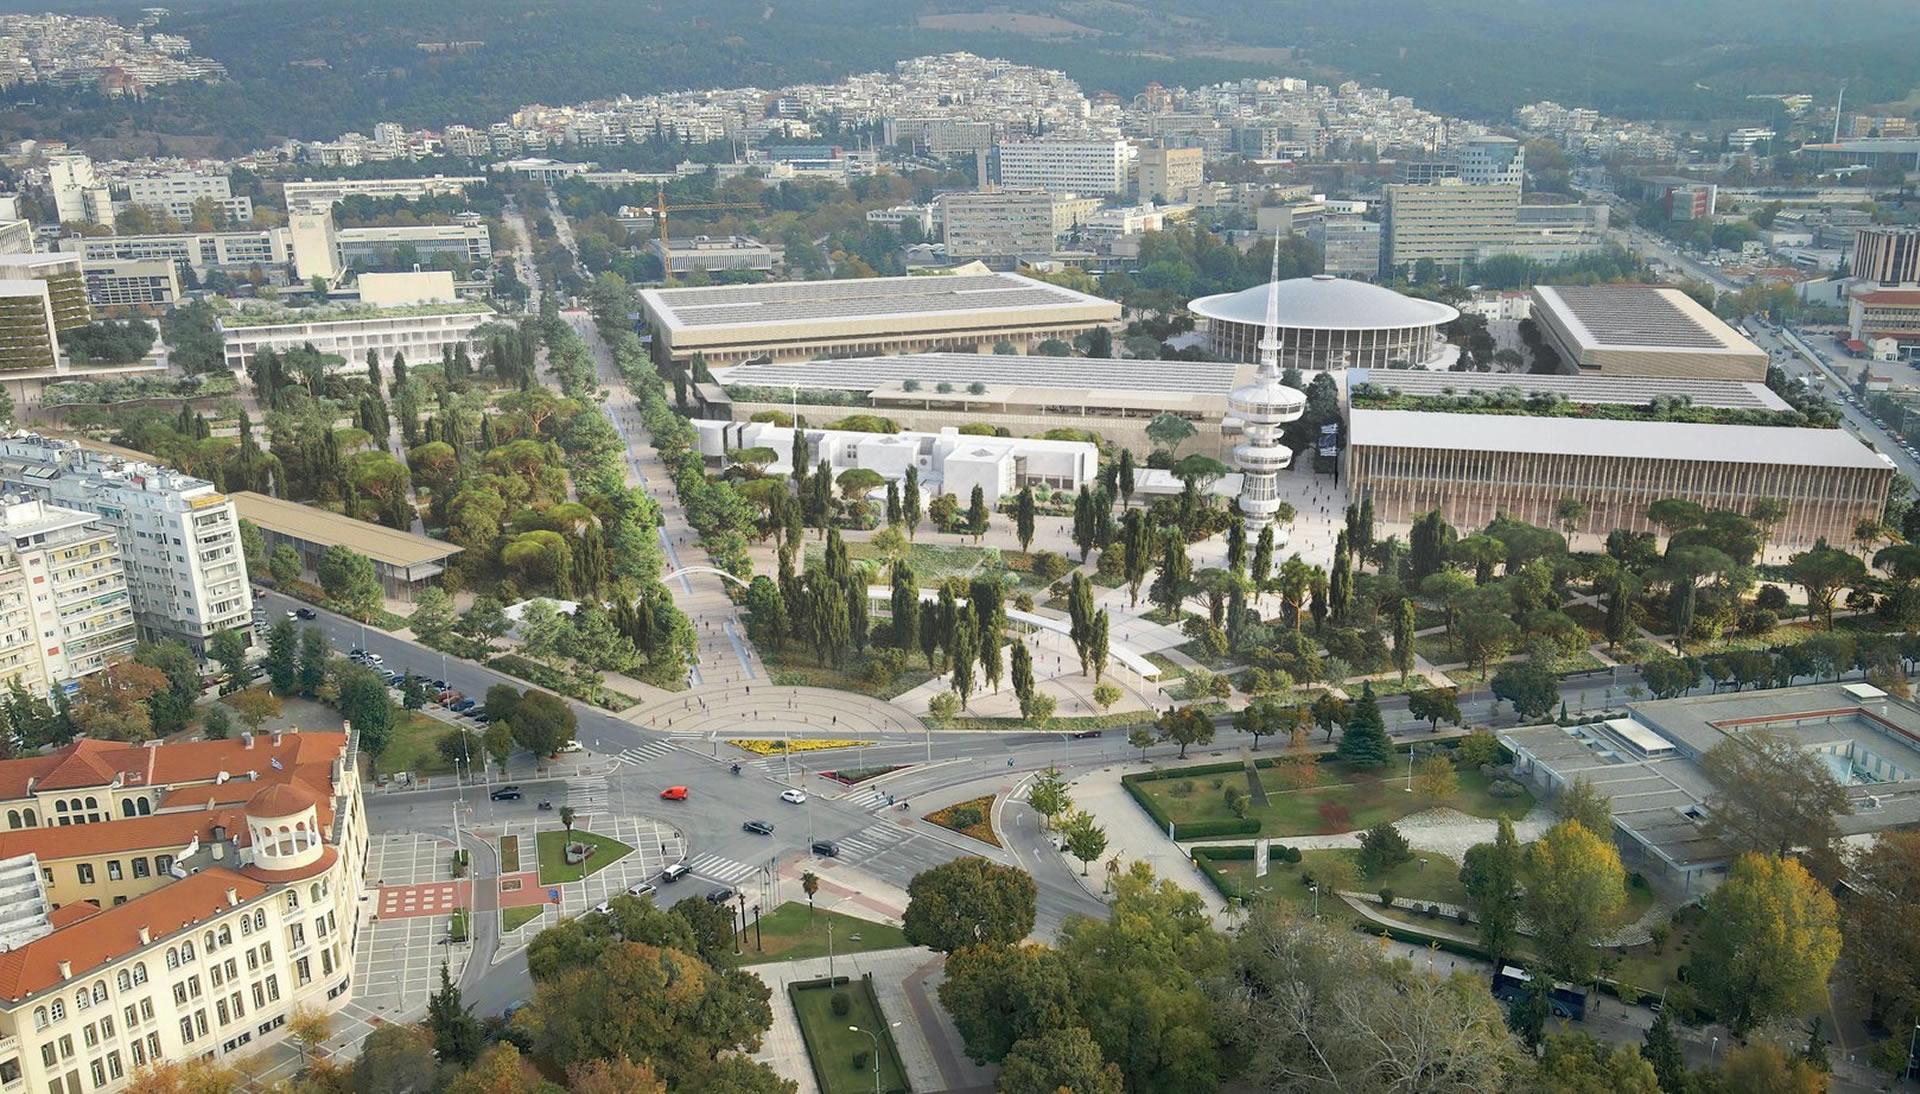 WILMOTTE & ASSOCIĖS ARCHITECTES, EGIS BATIMENTS INTERNATIONAL, NEVEUX ROUYER PAYSAGISTE DPLG